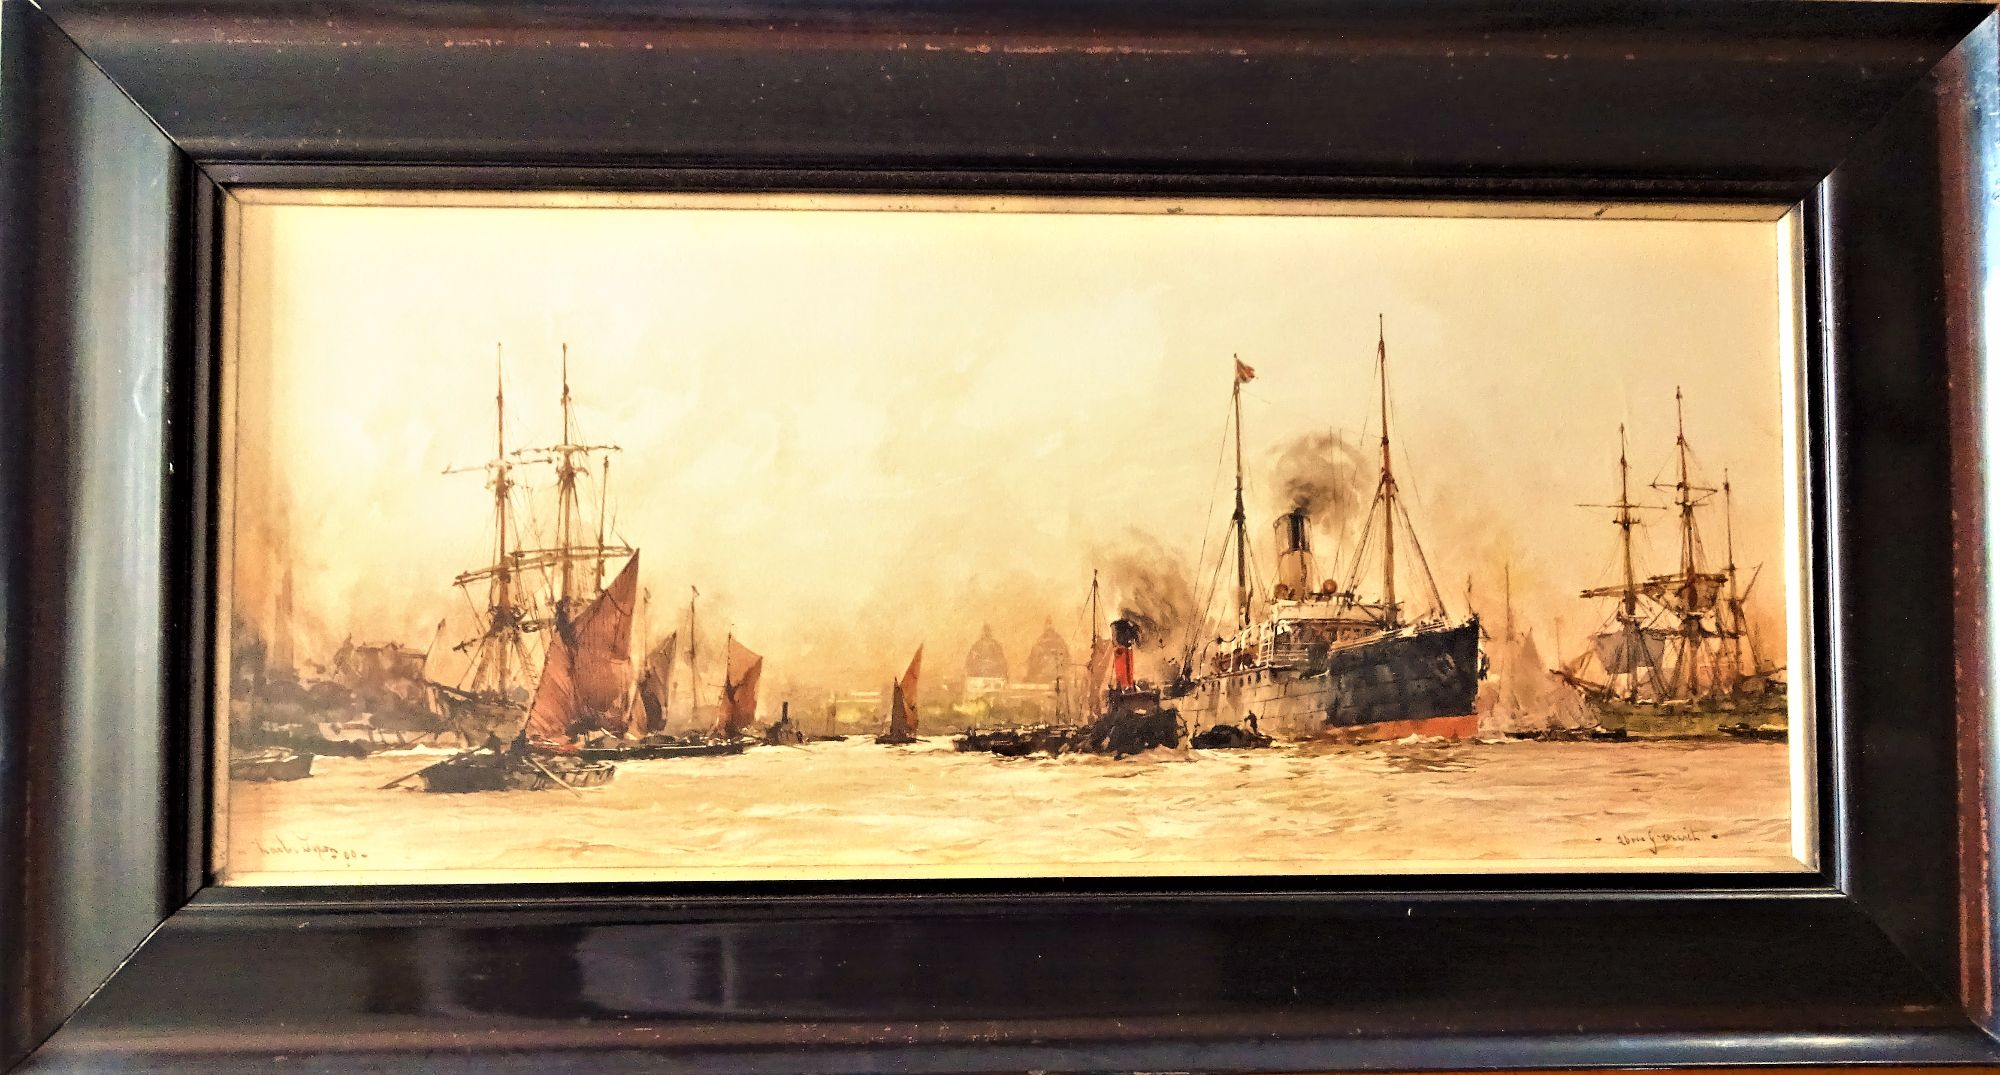 Charles Dixon, colour litho, Above Greenwich, 1909. c1920. Original frame.